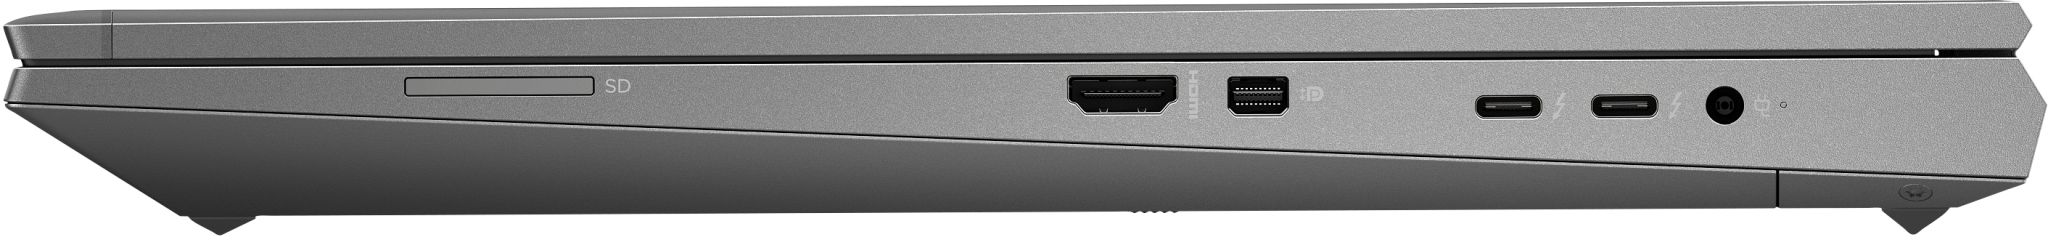 HP ZB17 G7 I7-10850H 32 512 3000-6 W10P